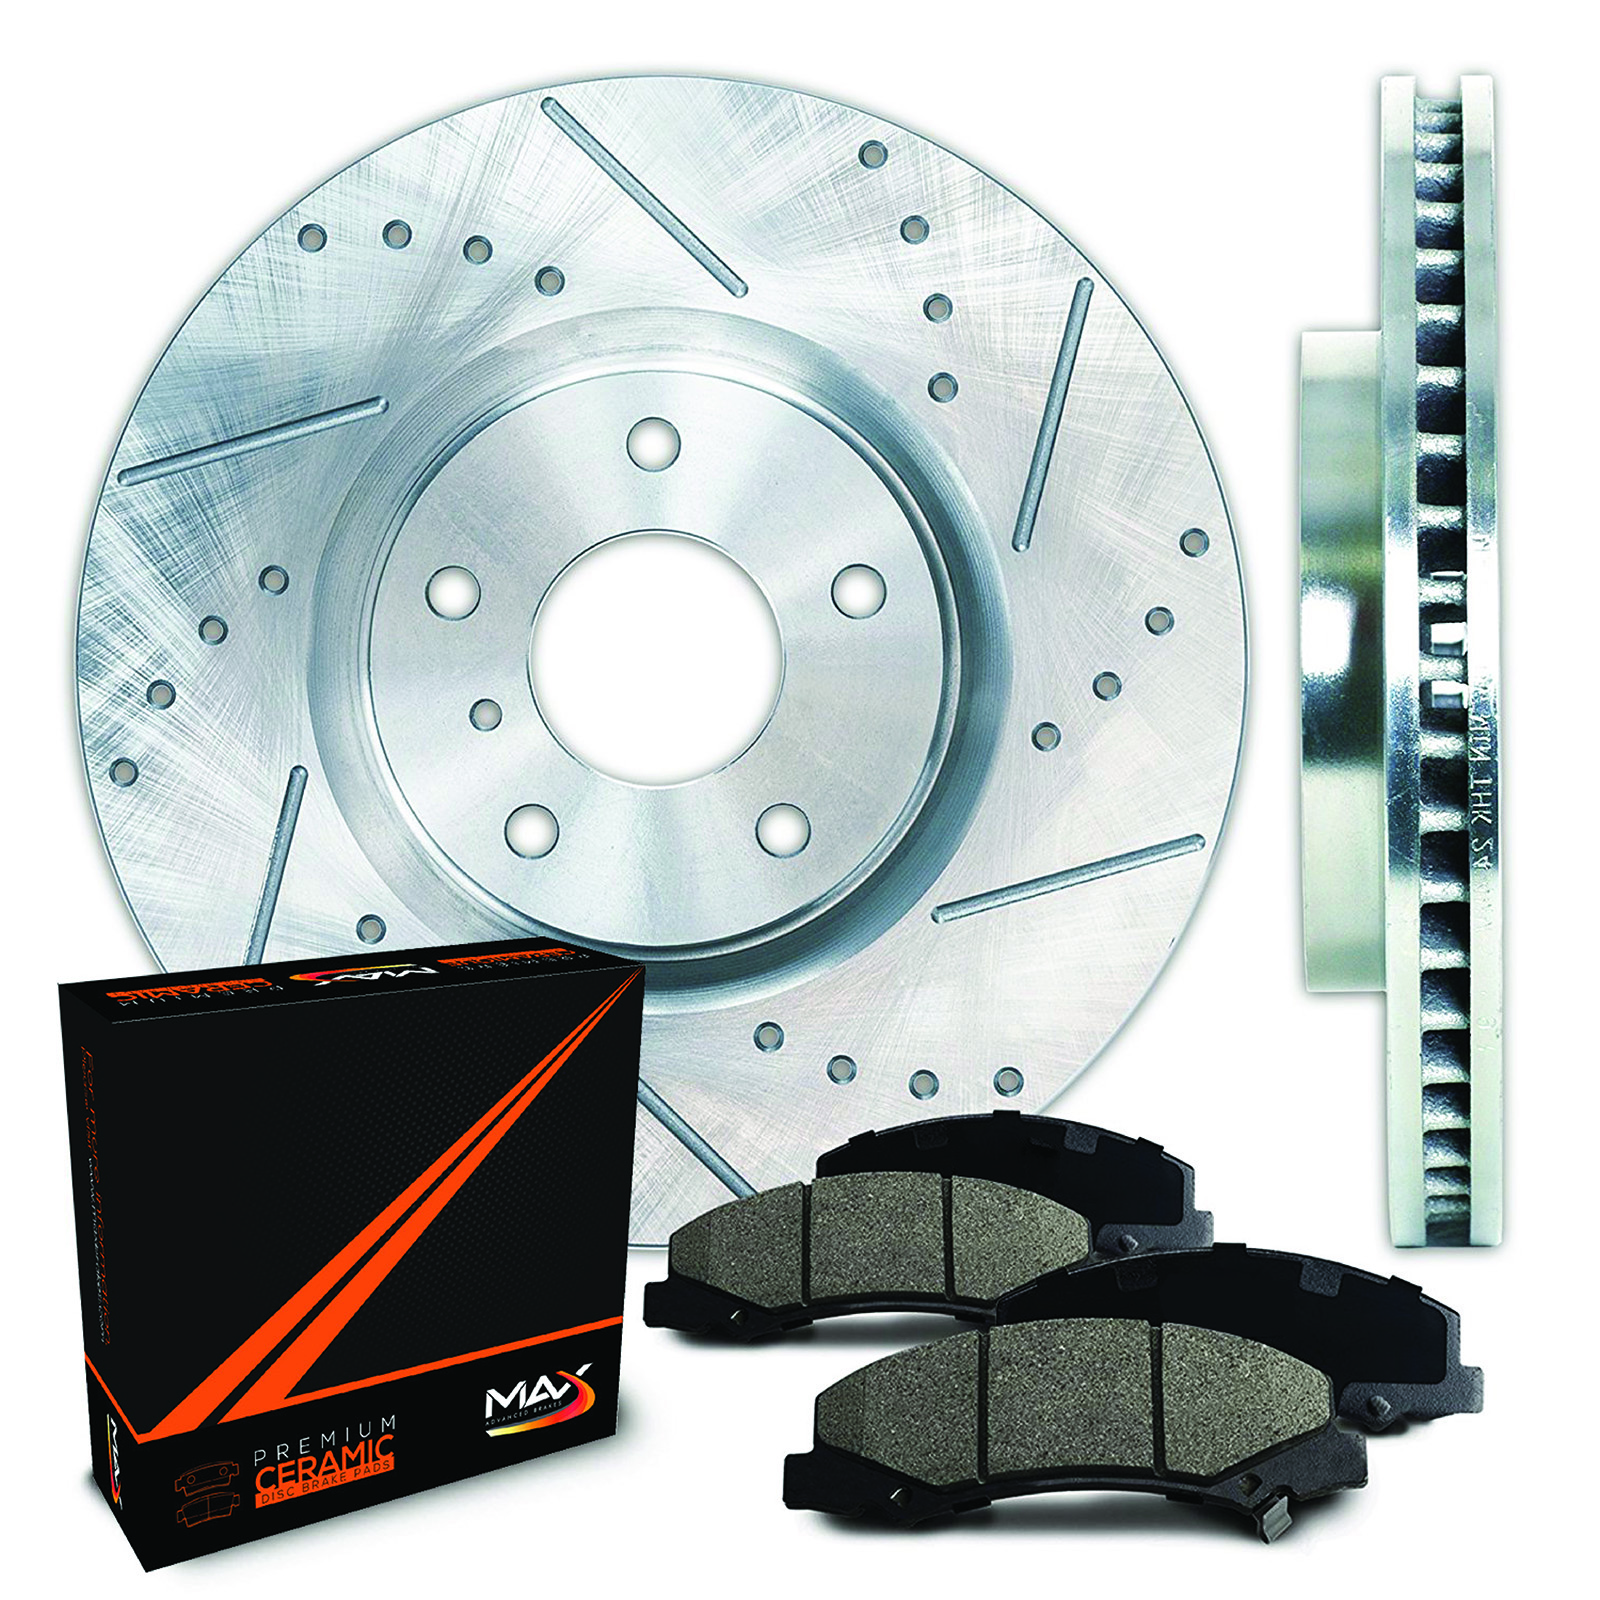 Max Advanced Brakes >> Pasmag Performance Auto And Sound Max Advanced Brakes Silver